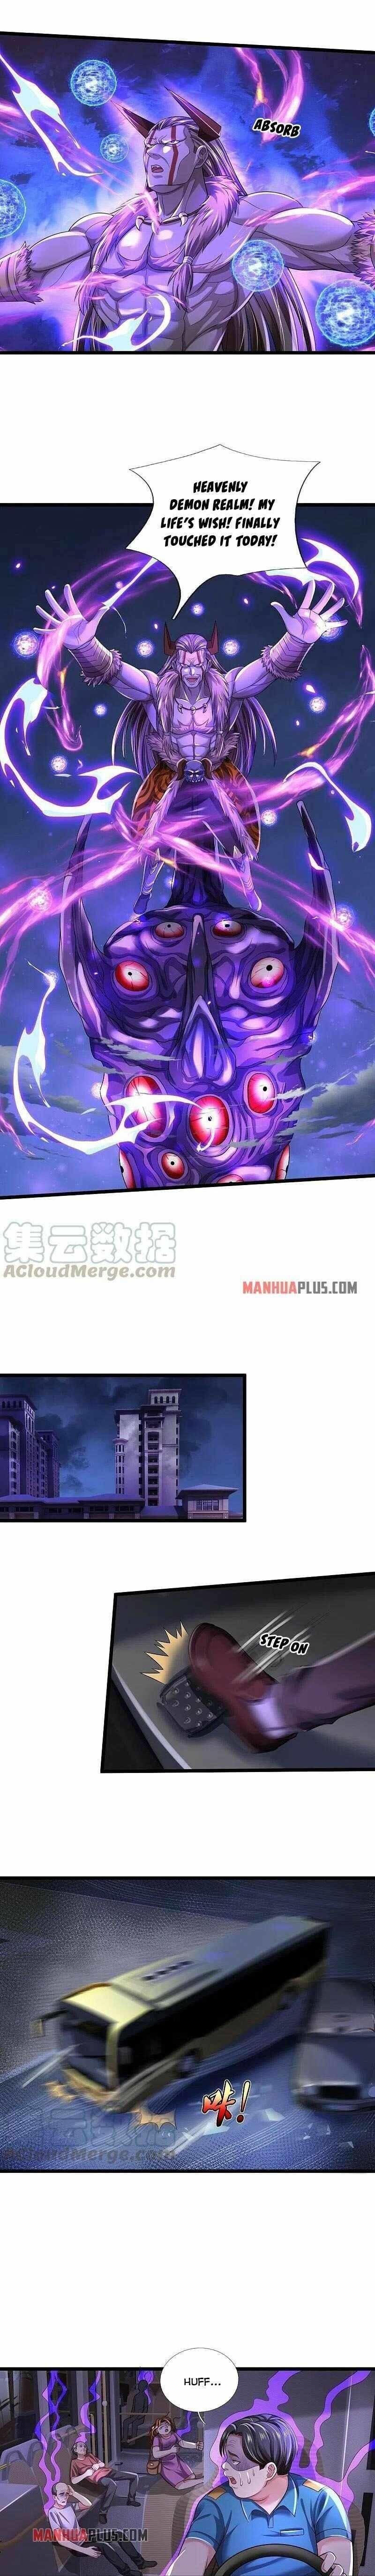 I'm The Great Immortal Chapter 339 page 3 - Mangakakalot